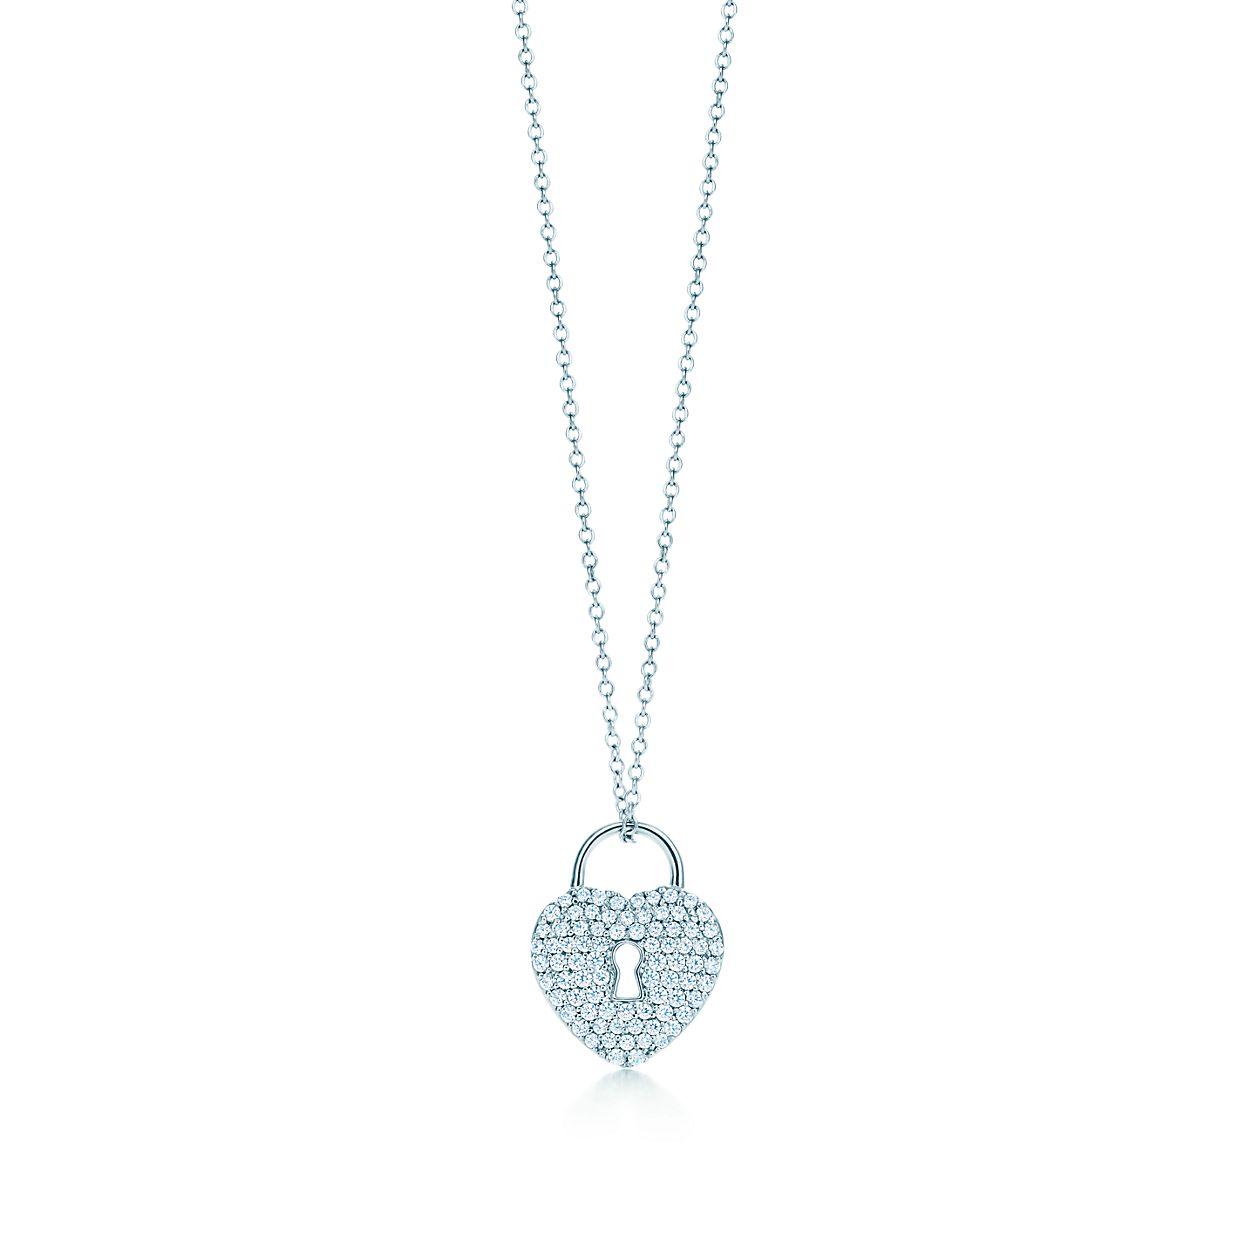 Tiffany locks heart lock pendant in platinum with diamonds on a 16 tiffany locksheart lock pendant tiffany locksheart lock pendant aloadofball Choice Image